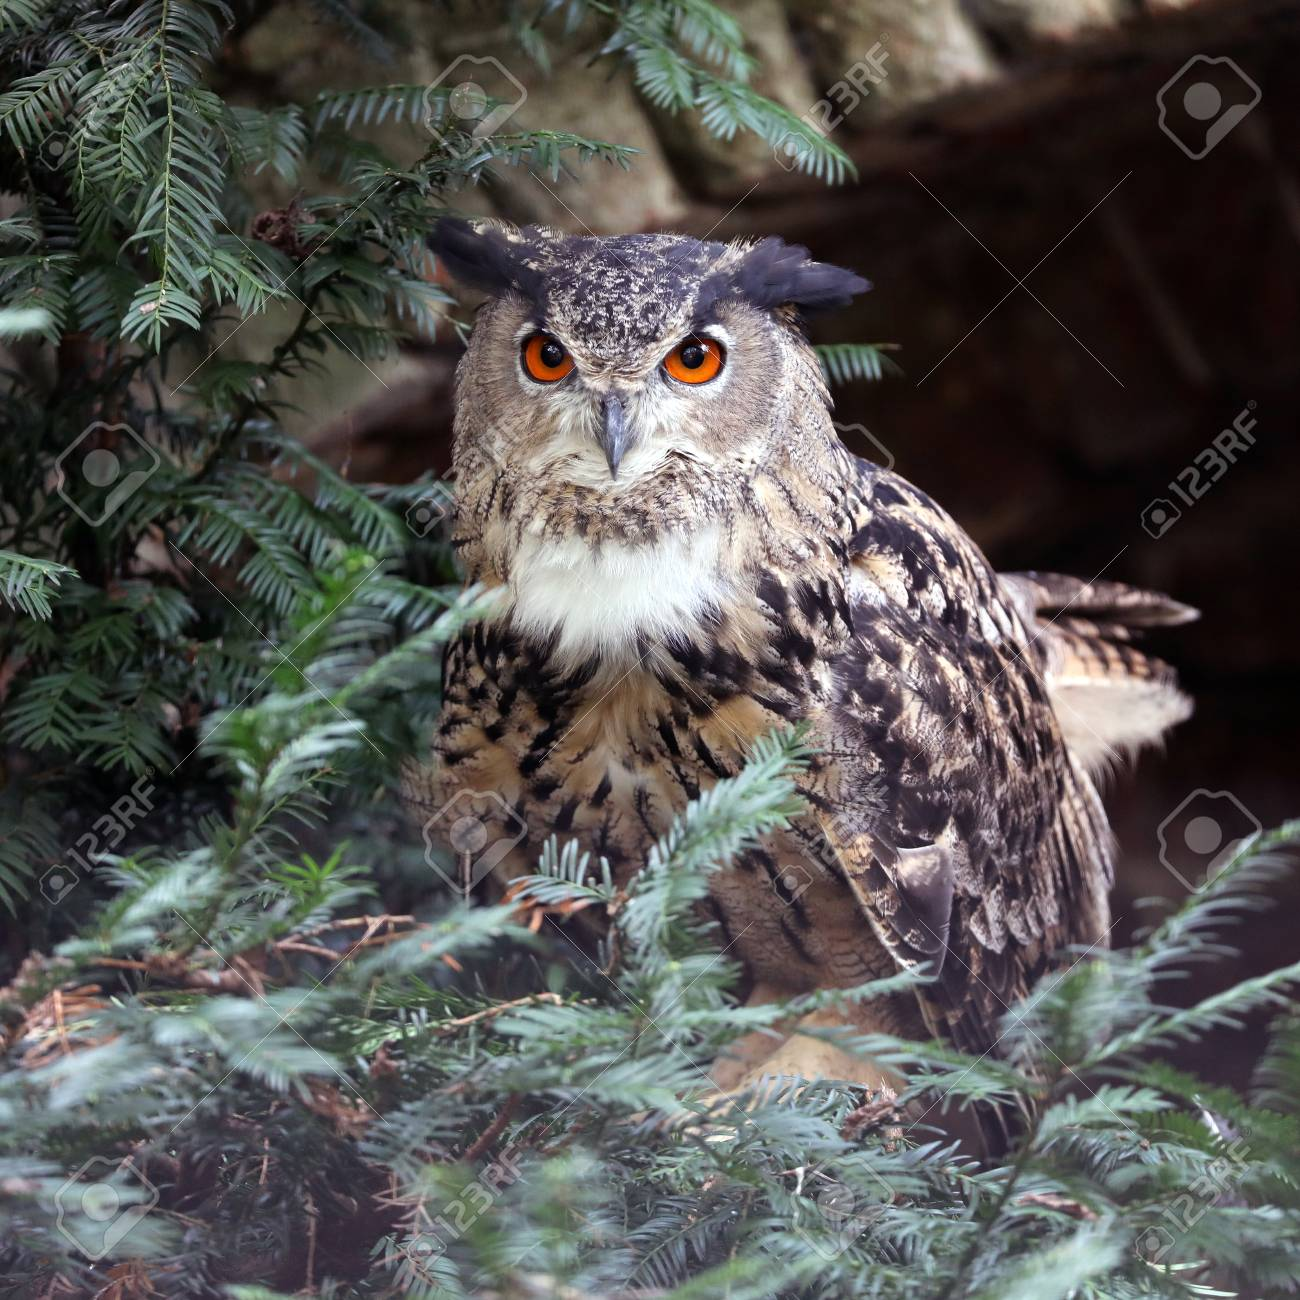 Eurasian eagle-owl at nature, close up view - 117916317